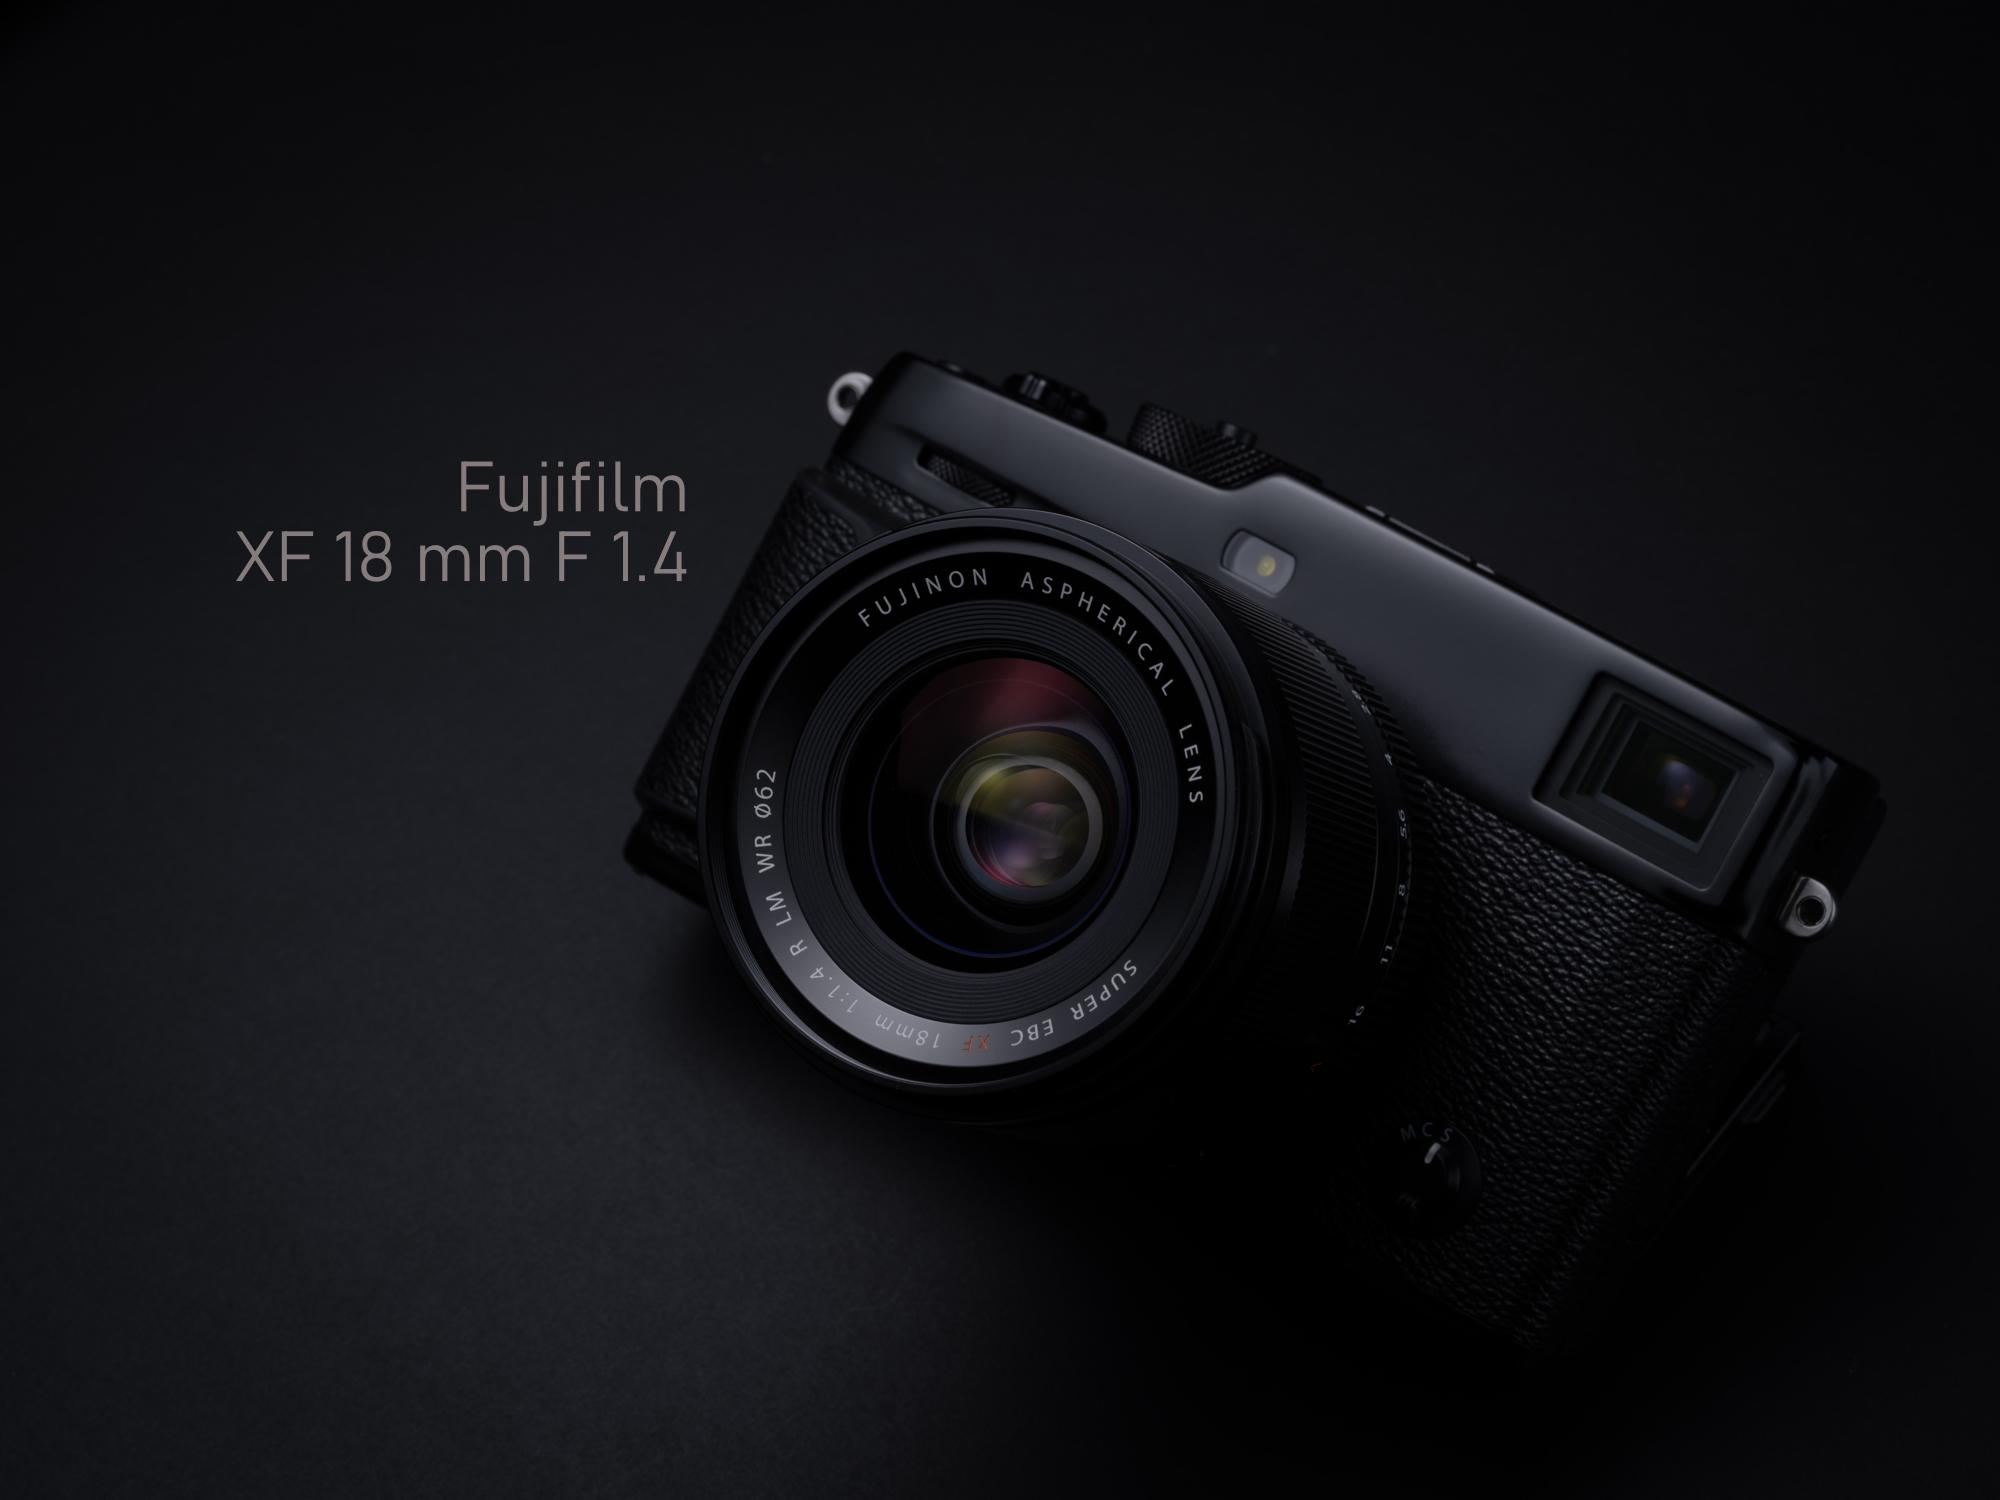 Fuji XF 18 mm F 1.4